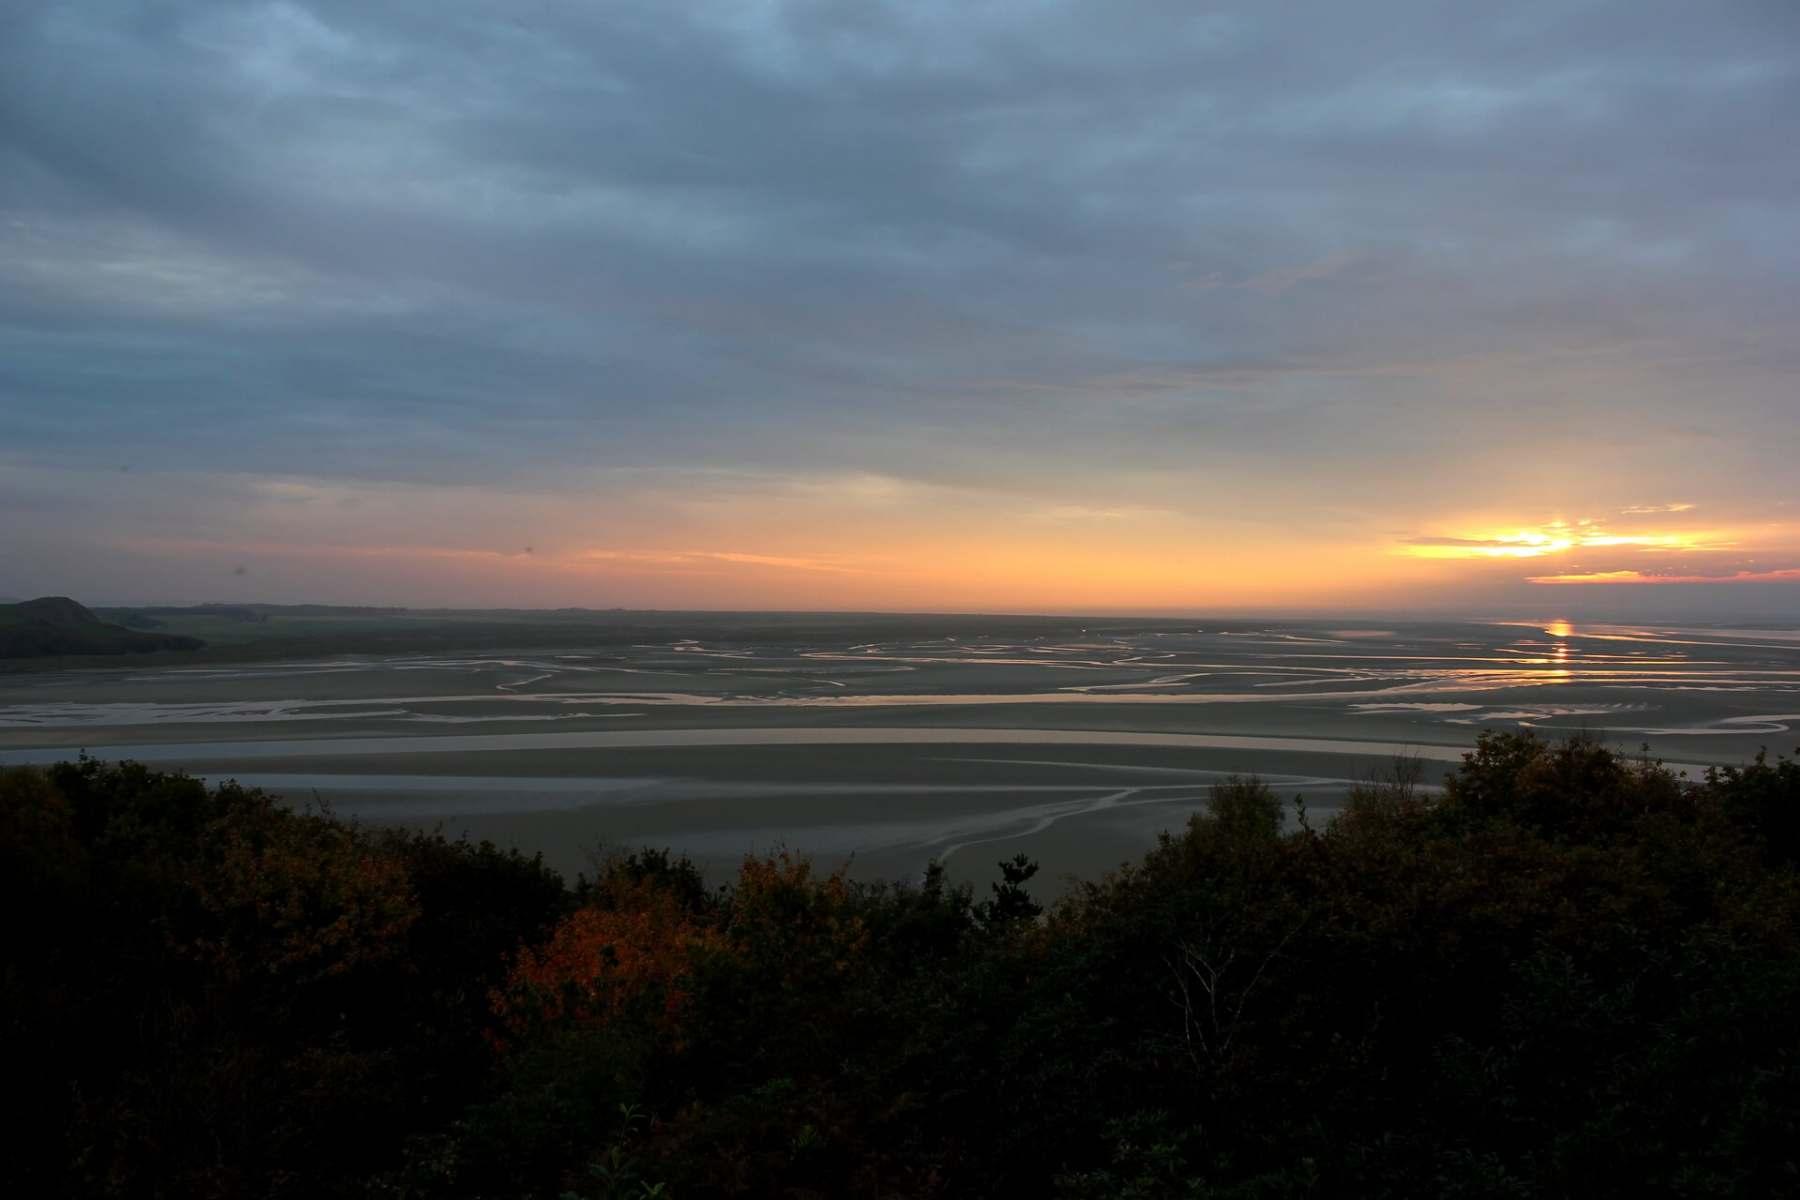 sunset-over-portmeirion-estuary-1